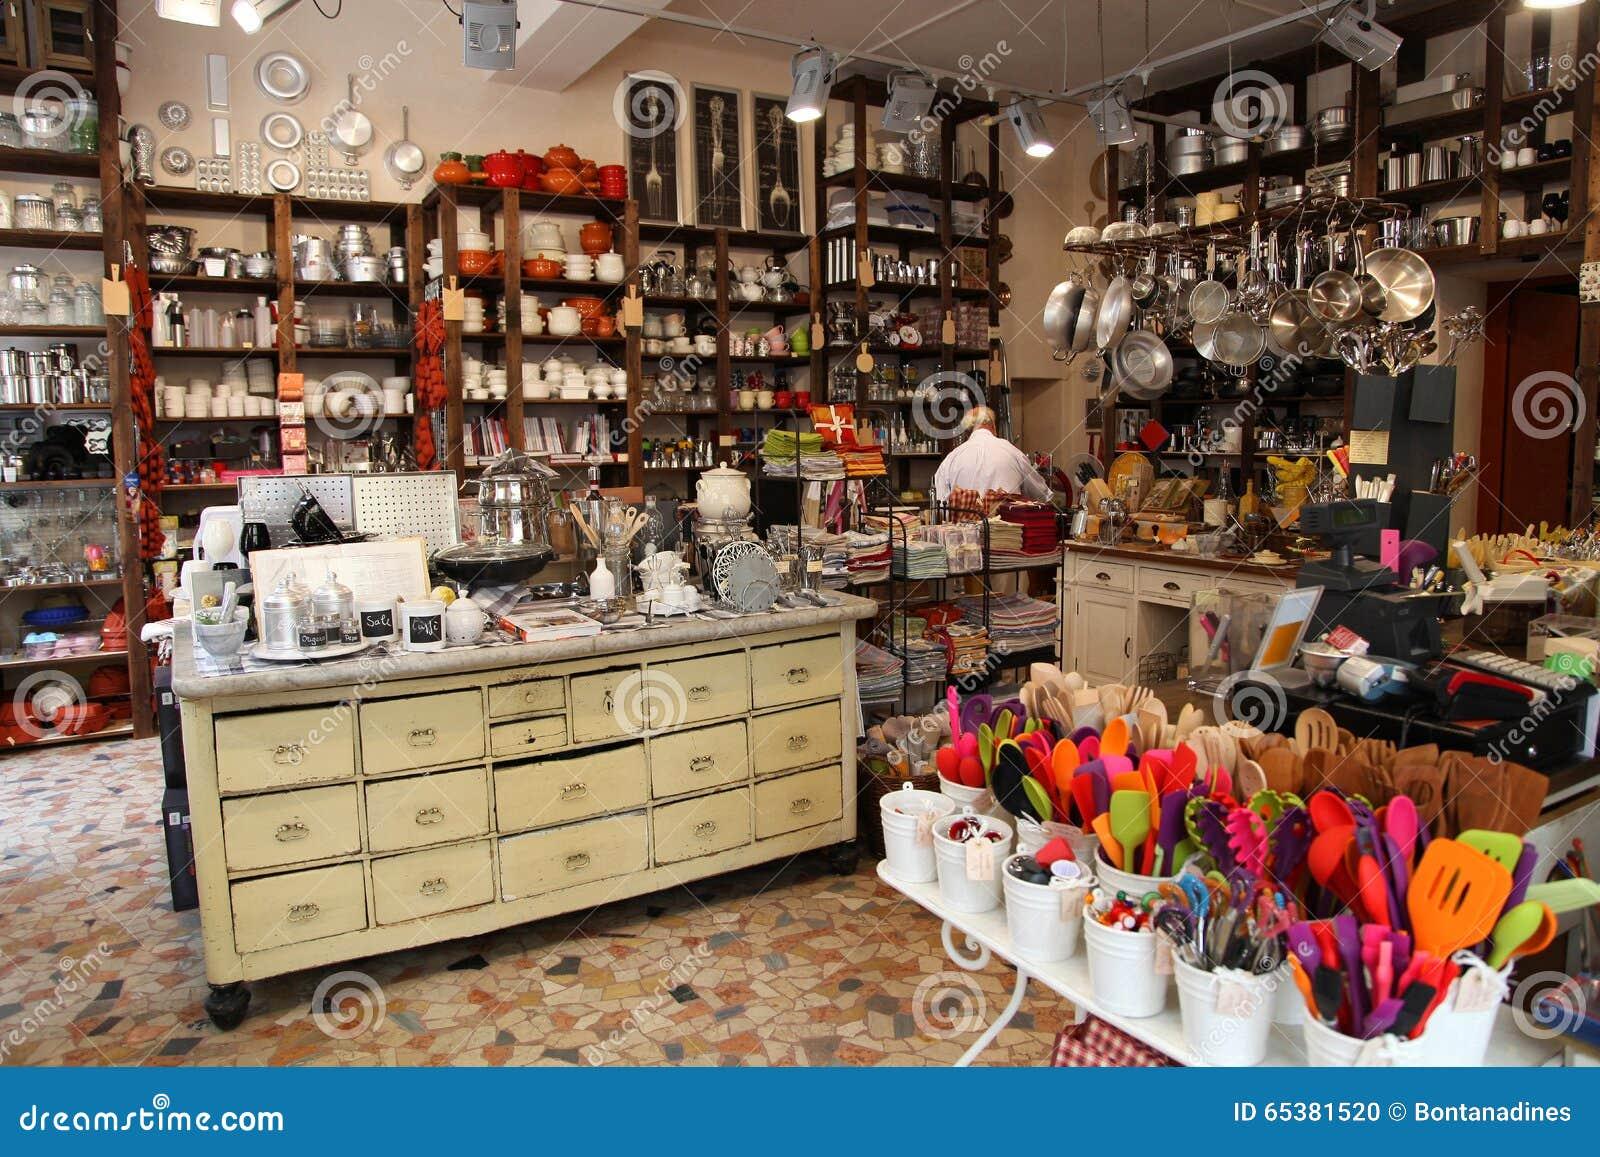 VERONA, ITALY - AUGUST 31, 2012: Lovely Italian Shop With ...